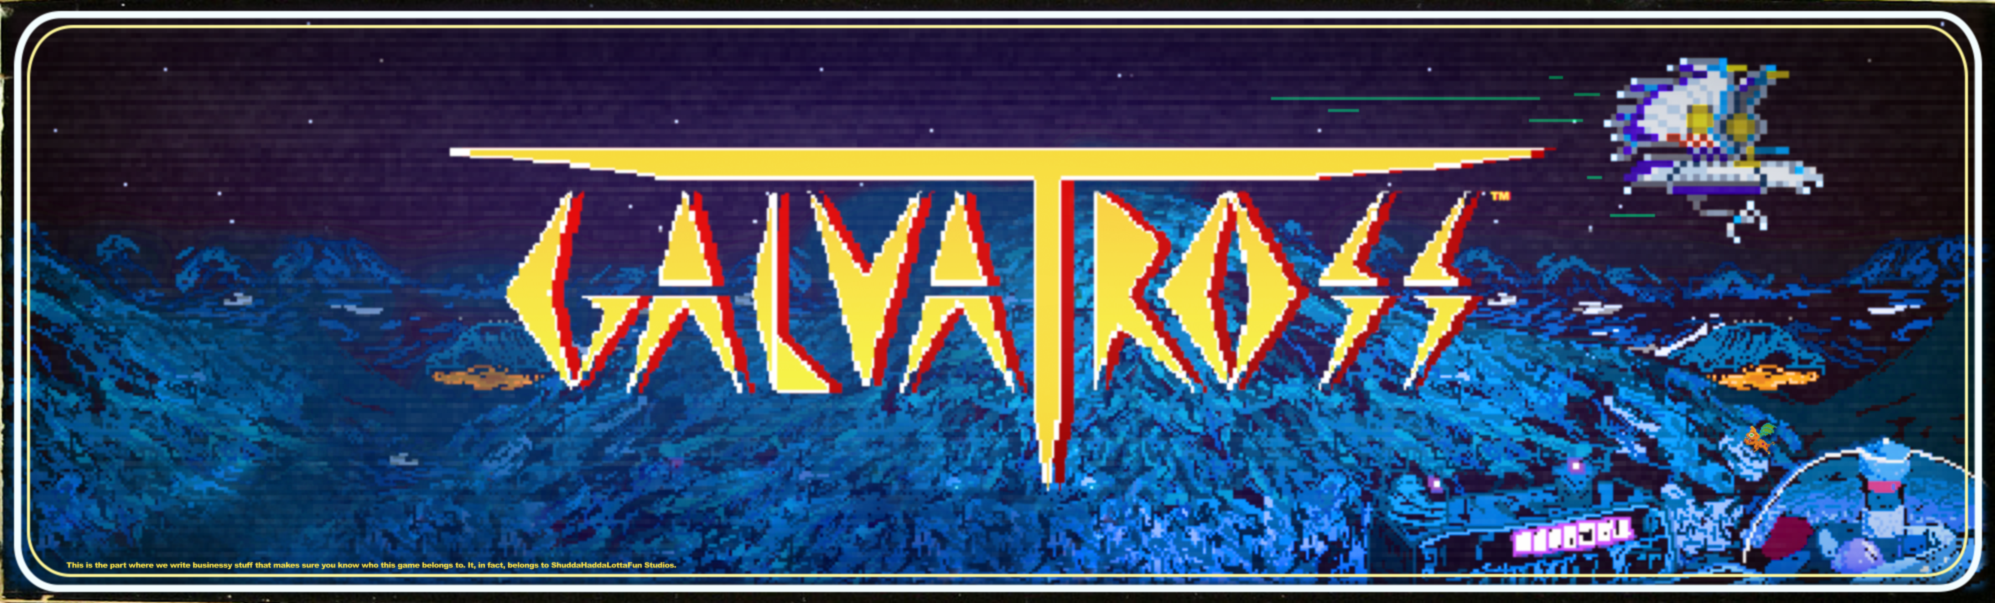 Galvatross